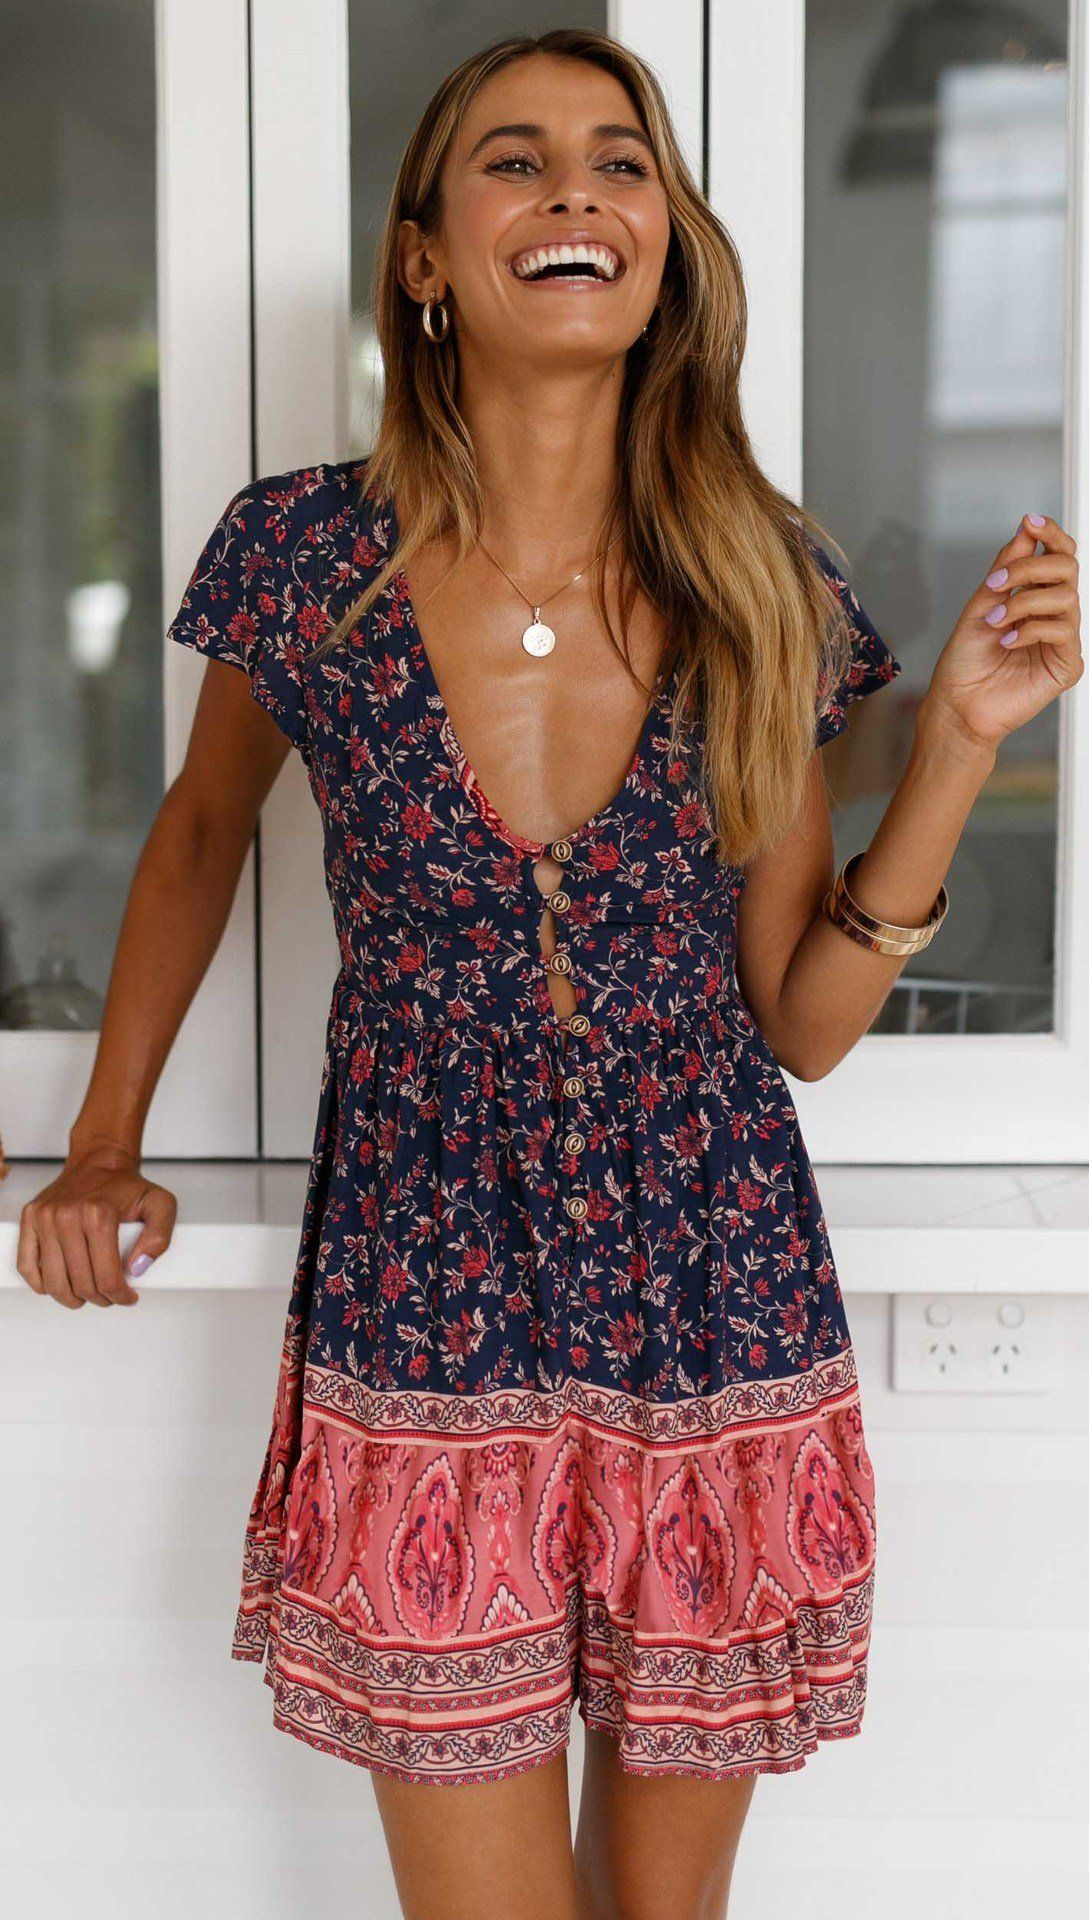 A-Line Bohemian Floral Dress Sexy V-neck Short Sleeve Mini Dress, Dark Blue / S 11